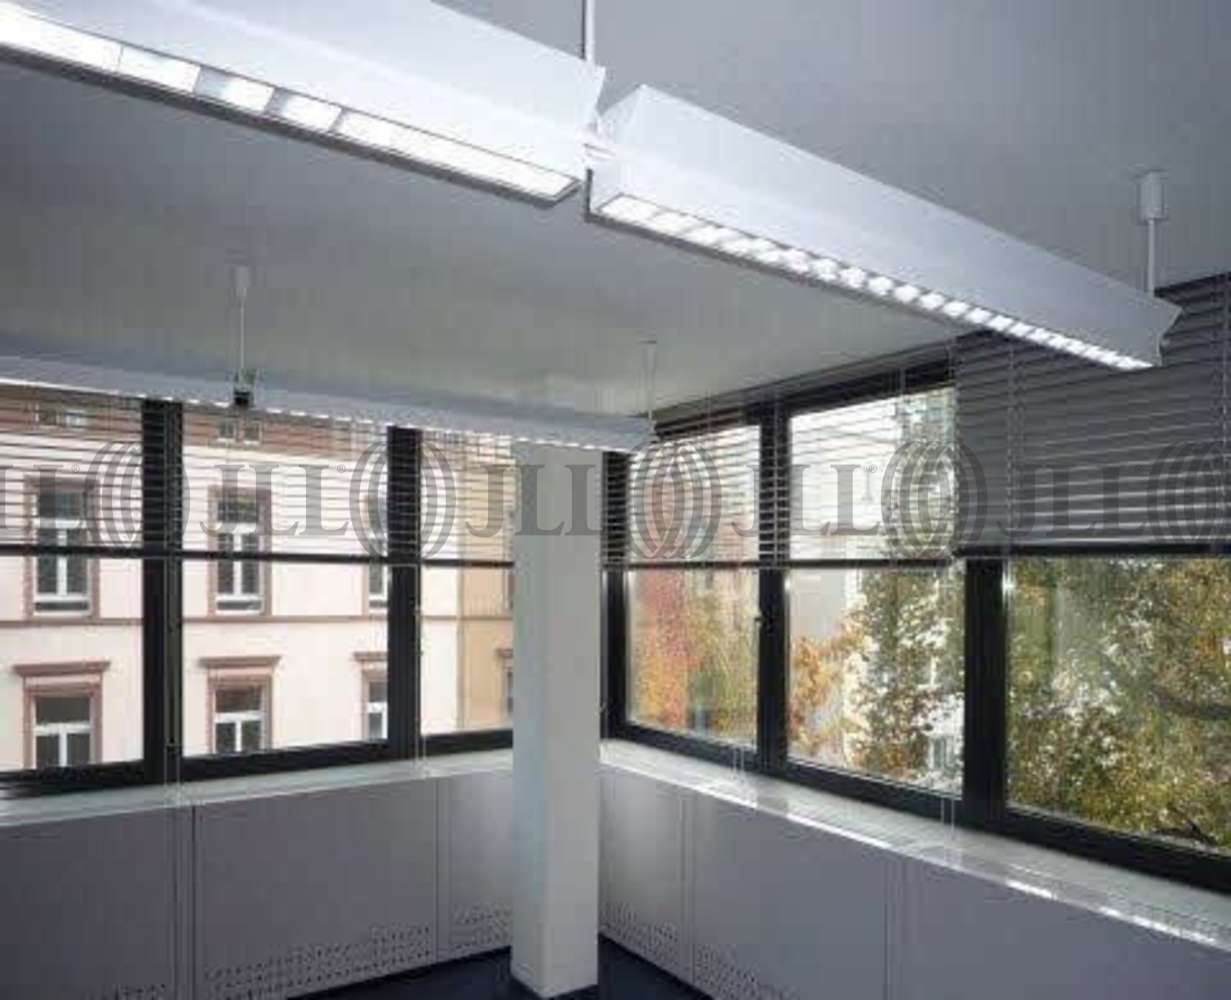 Büros Frankfurt am main, 60323 - Büro - Frankfurt am Main - F1651 - 9648228